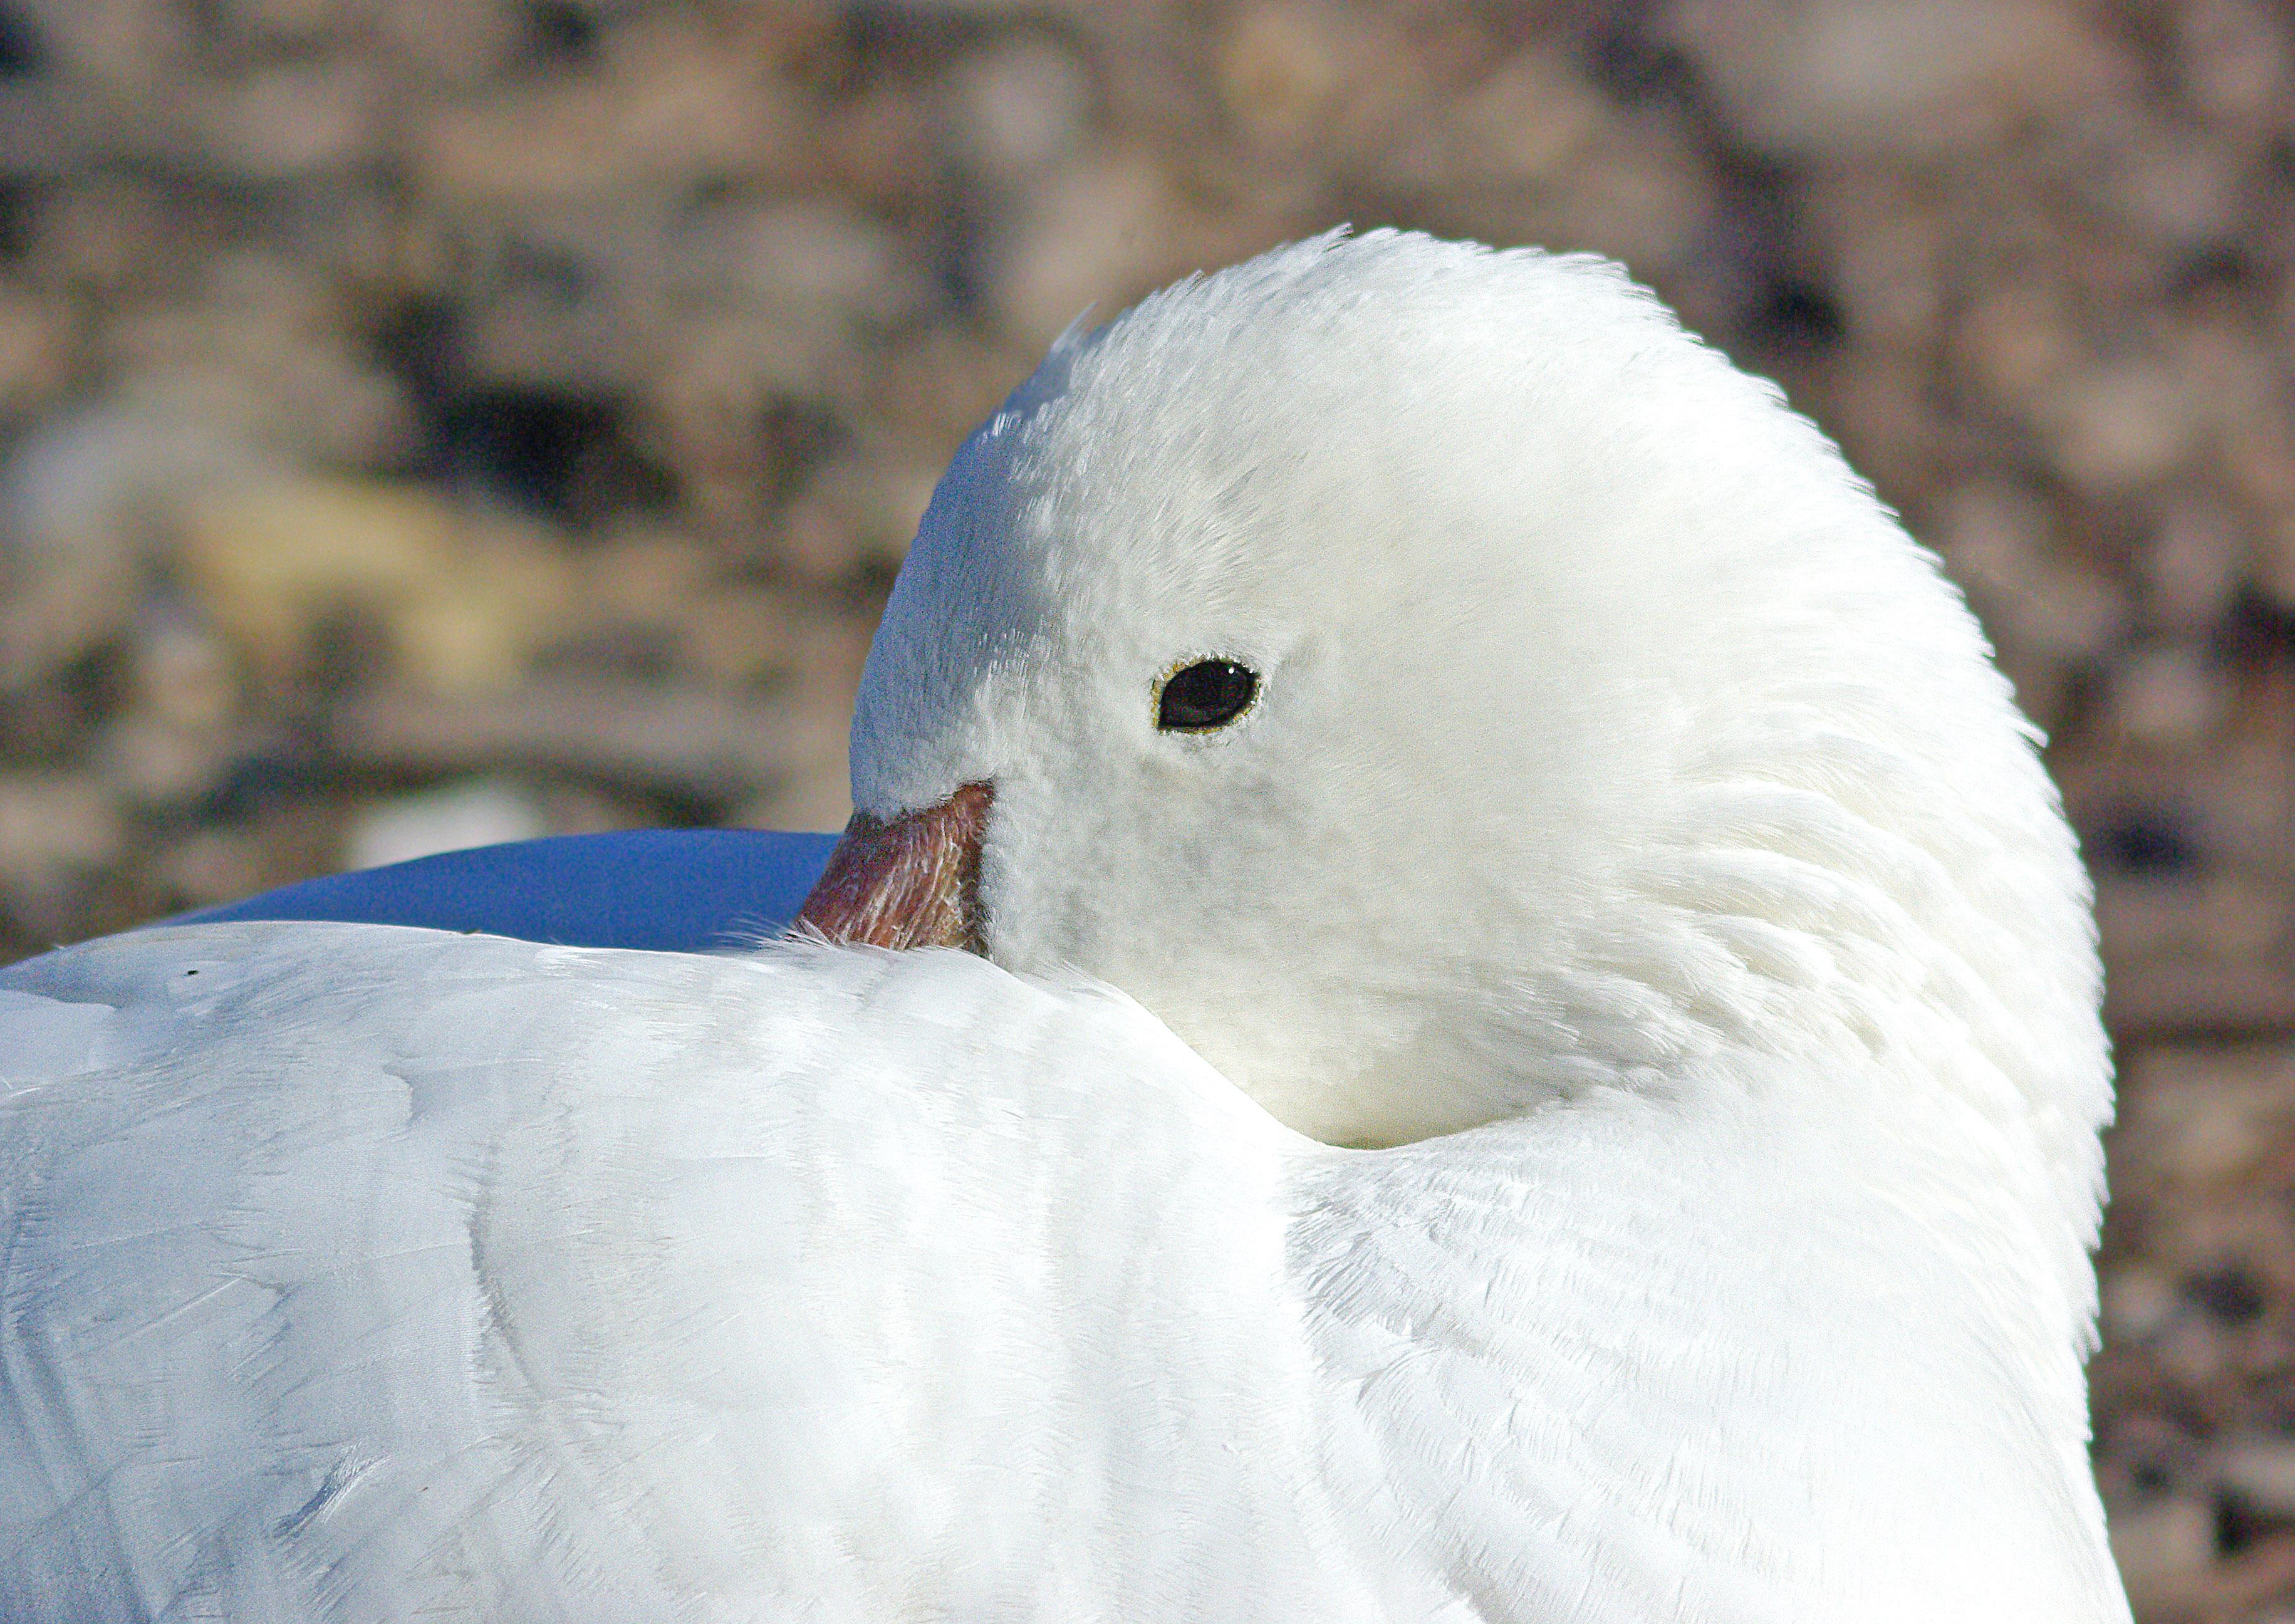 012 x 013 - snow x ross's goose (12-4-07) prob hybrid, laguna, sloco, ca (3) photo